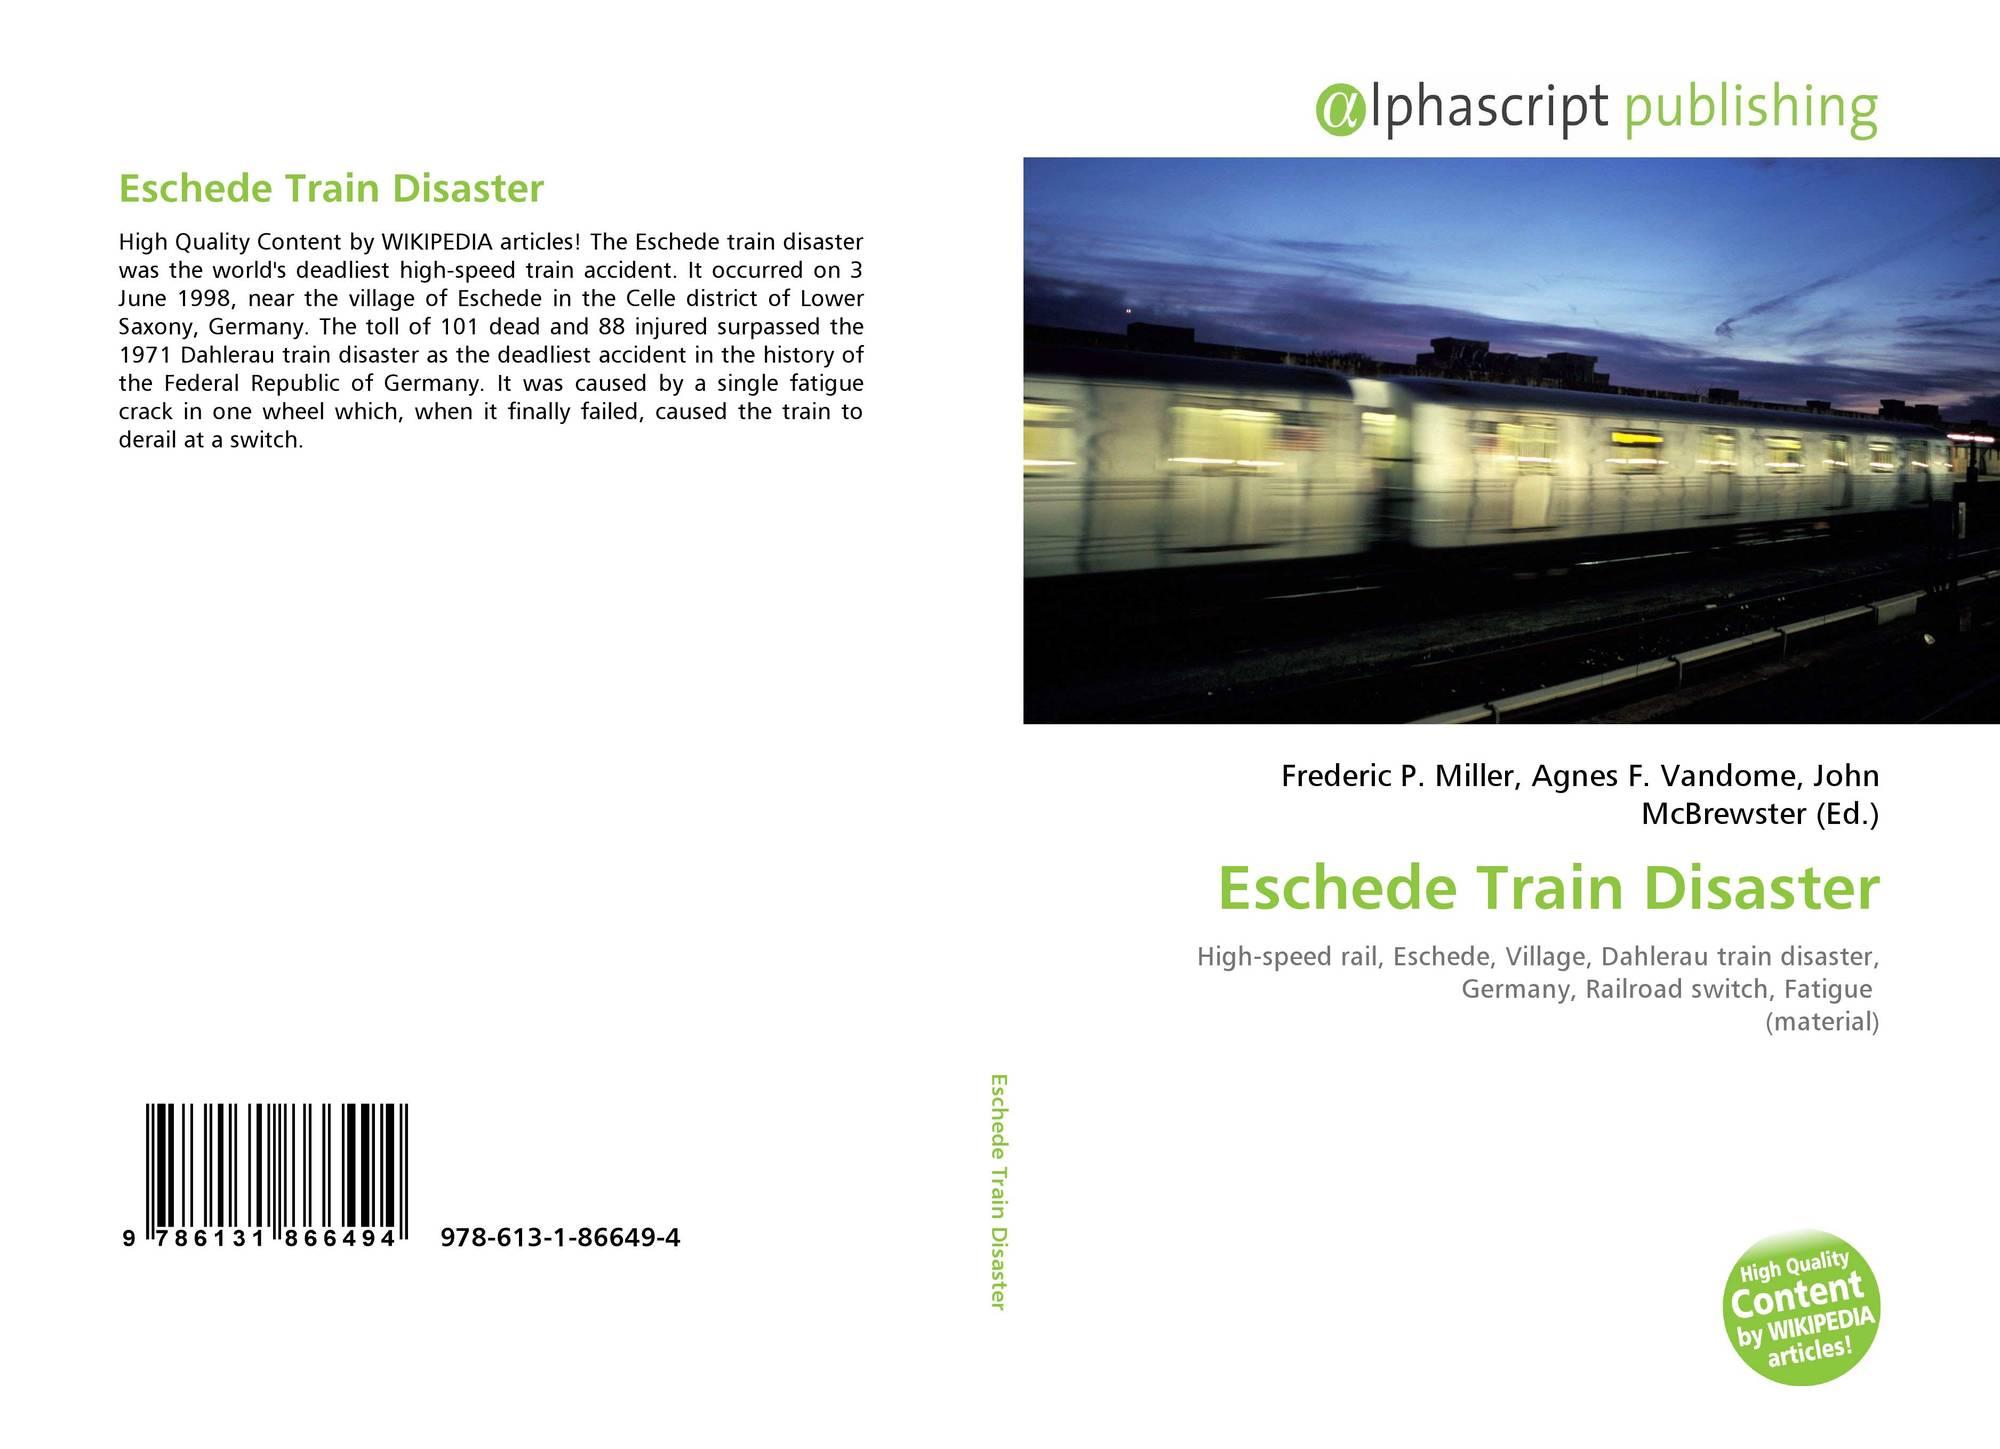 Dahlerau train disaster